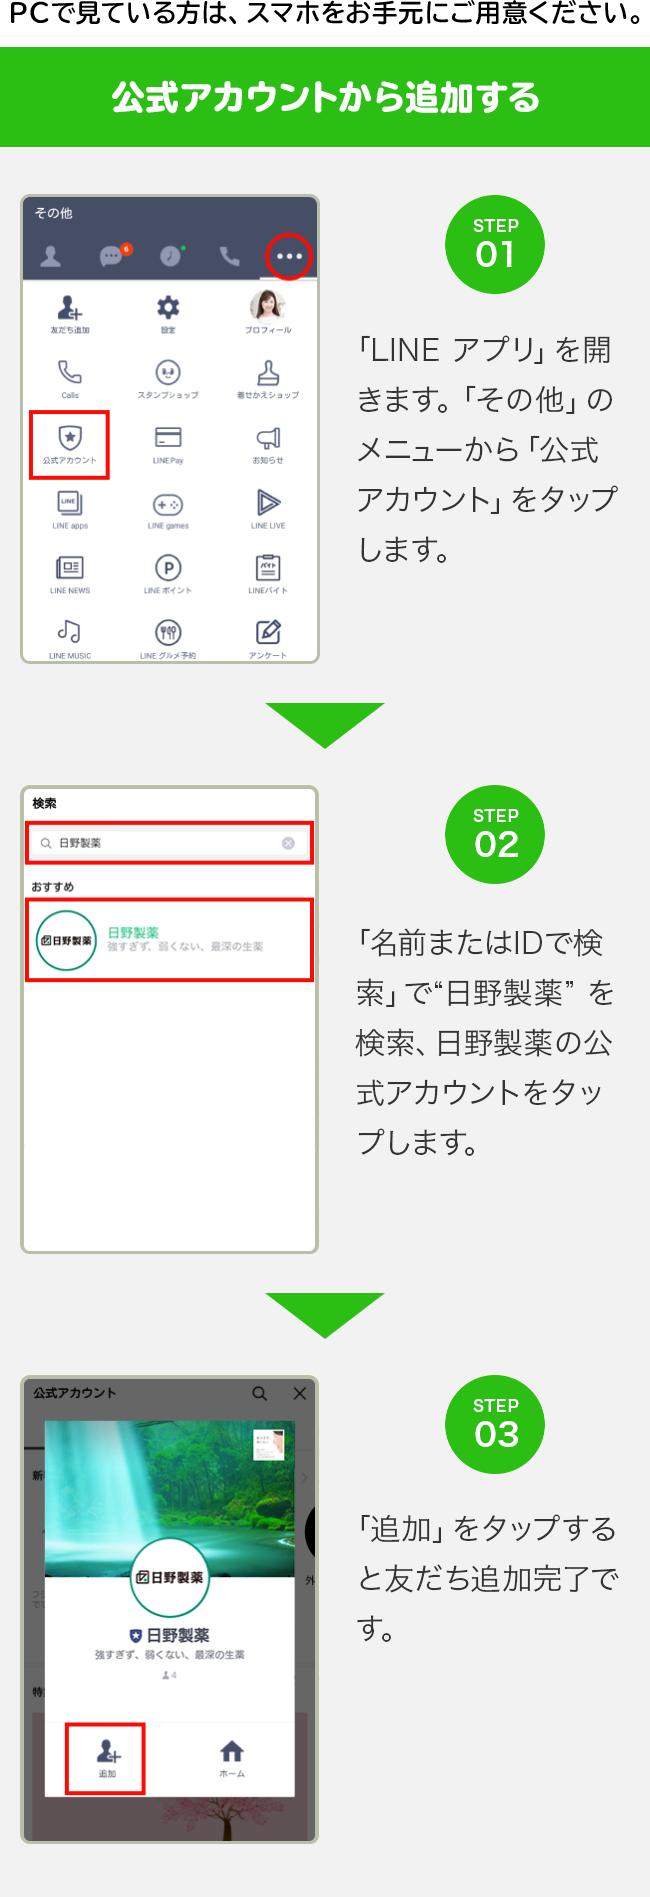 LINE@の登録方法 公式アカウントから追加する